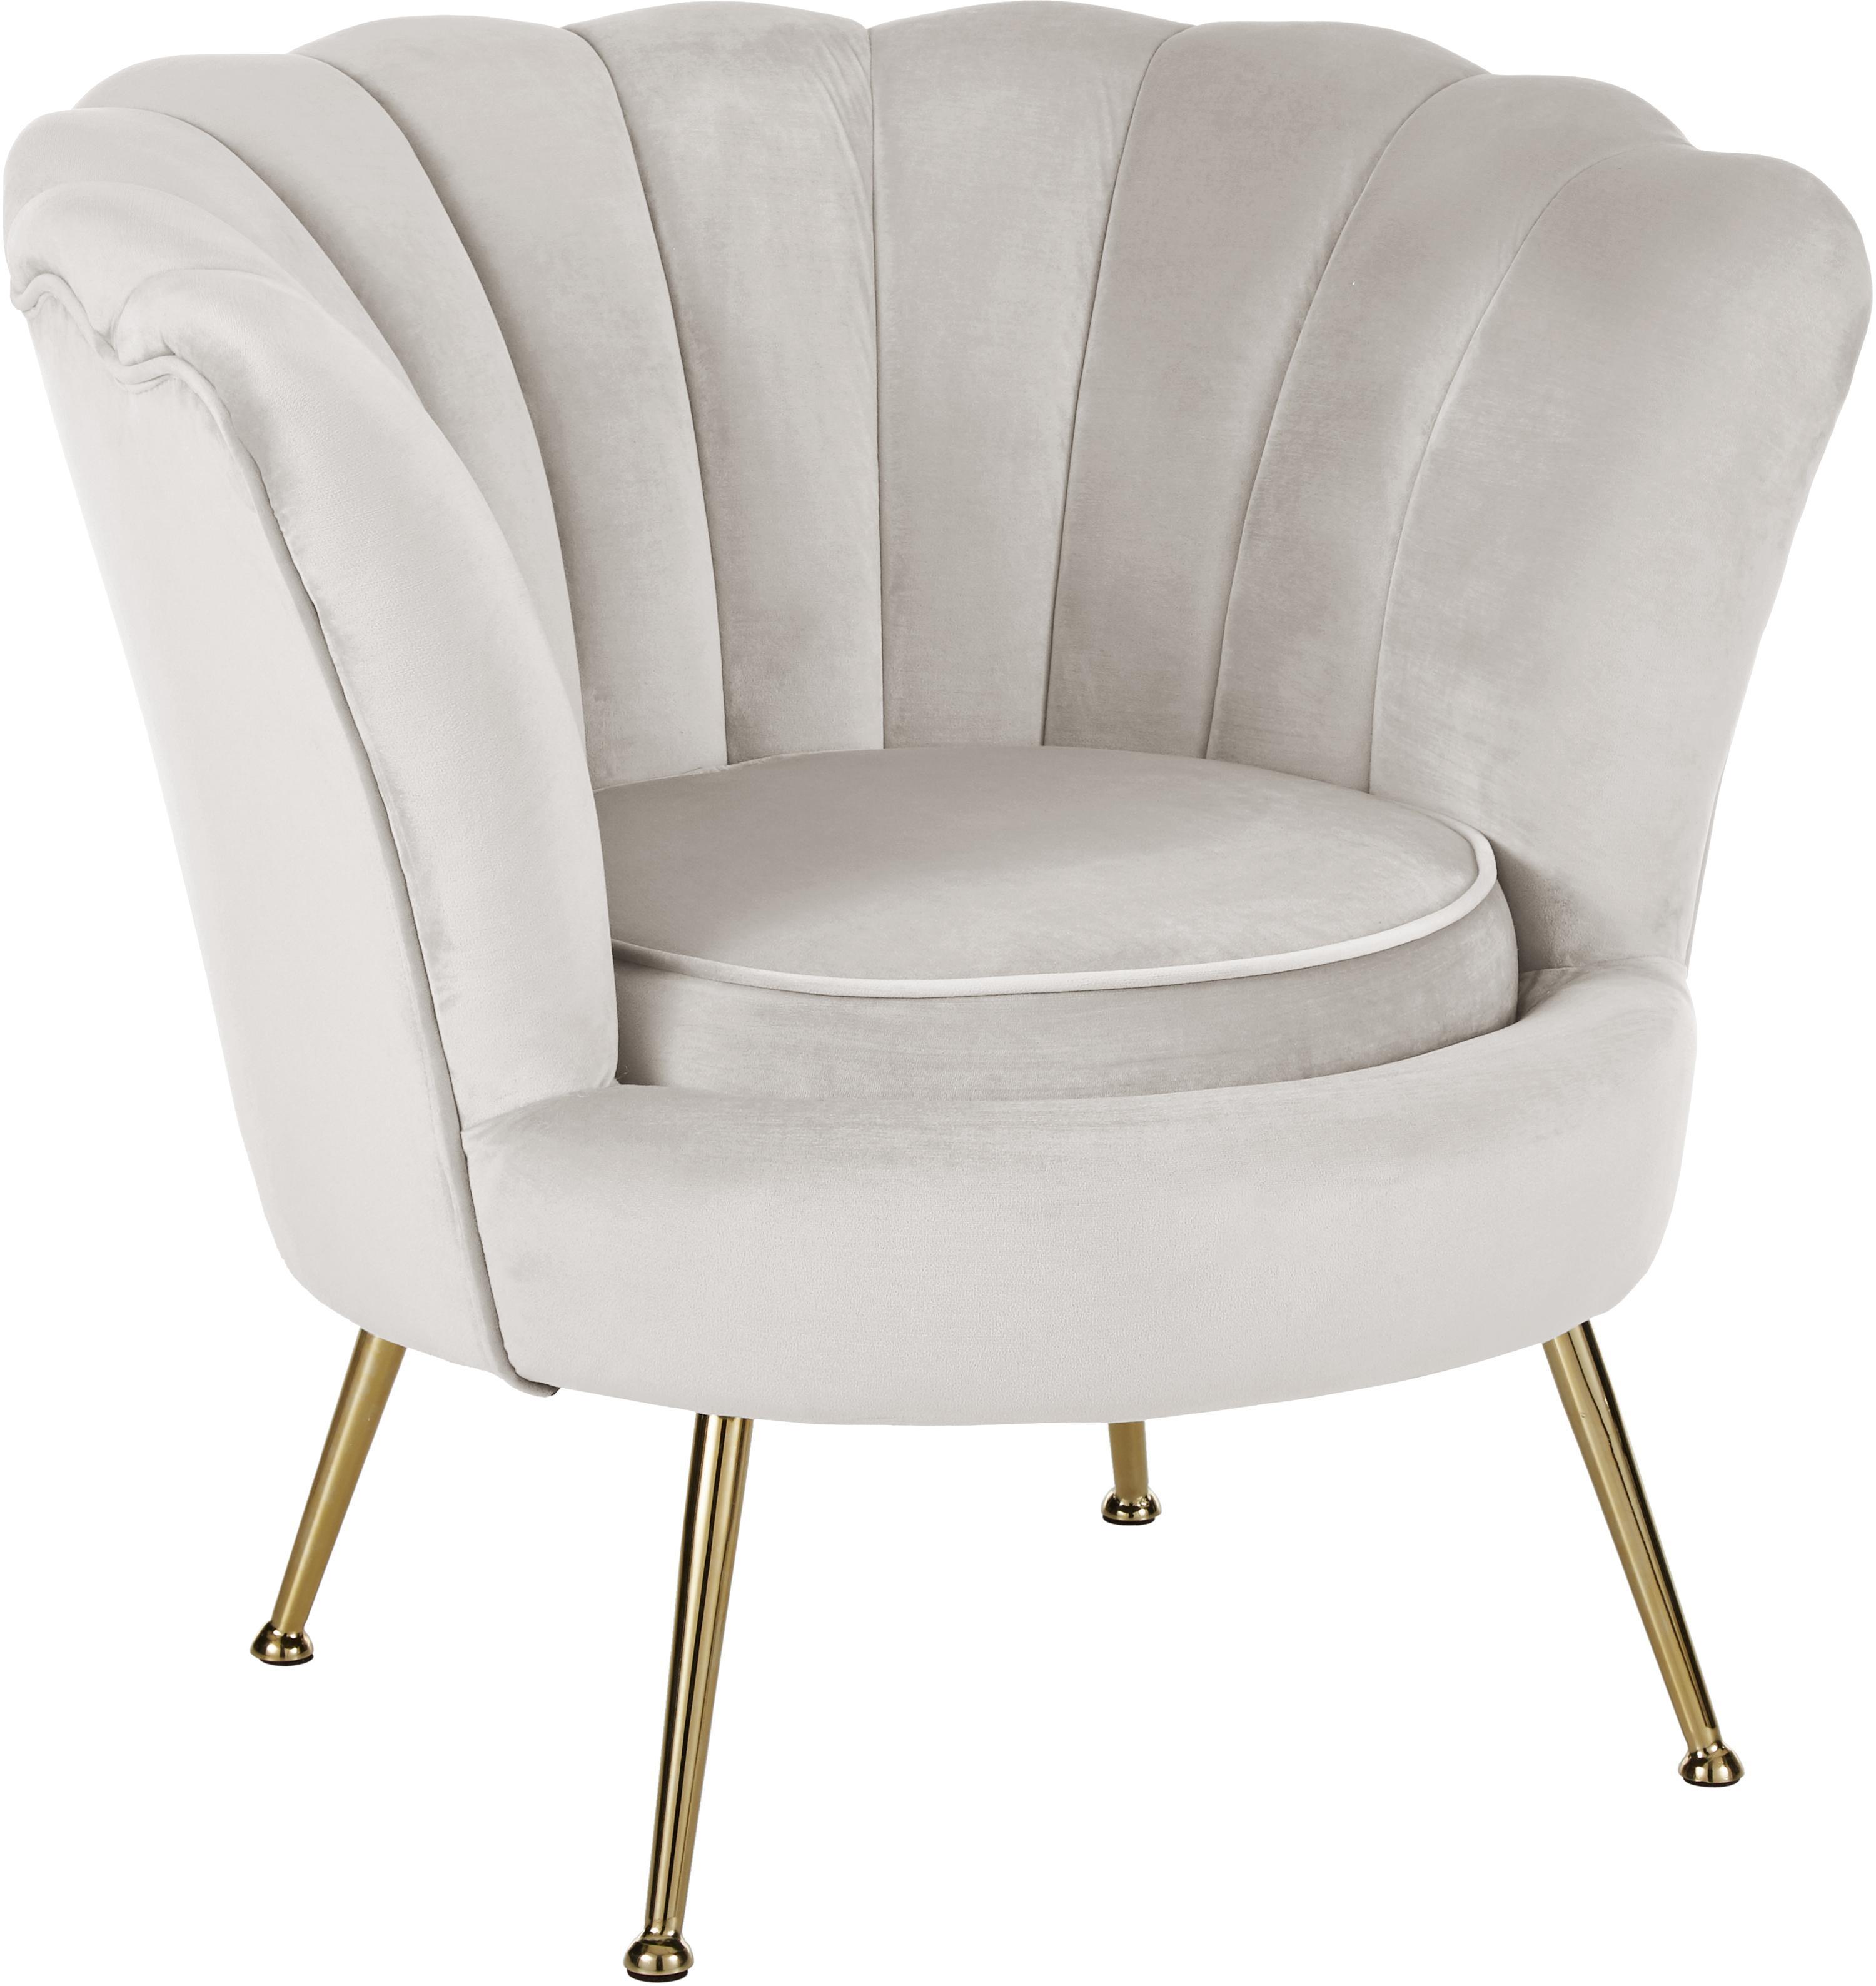 Samt-Sessel Oyster, Bezug: Samt (Polyester) 30.000 S, Gestell: Sperrholz, Füße: Metall, galvanisiert, Samt Cremeweiß , 81 x 75 cm